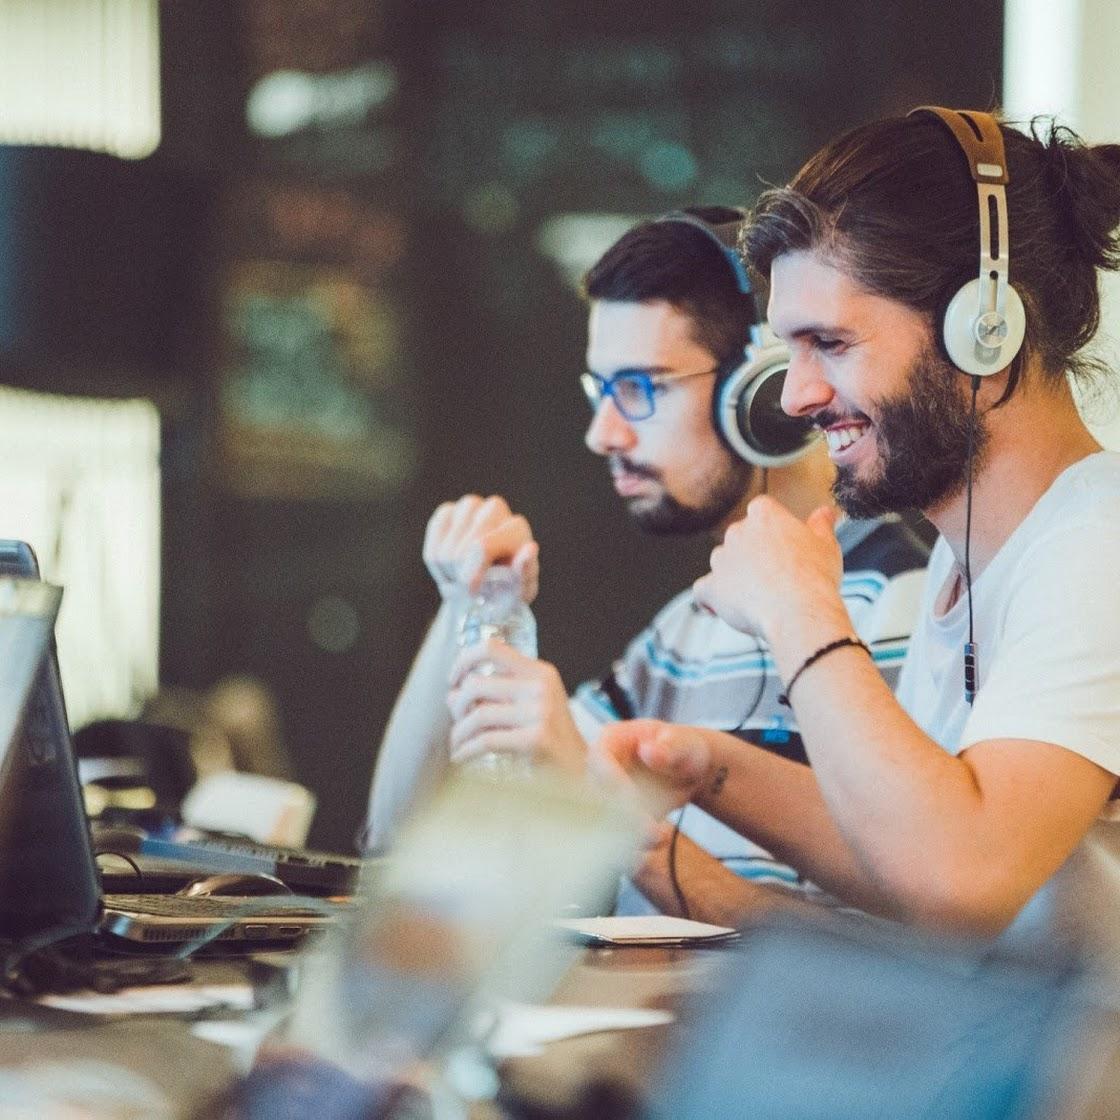 Team member watching a video on laptop while wearing headphones